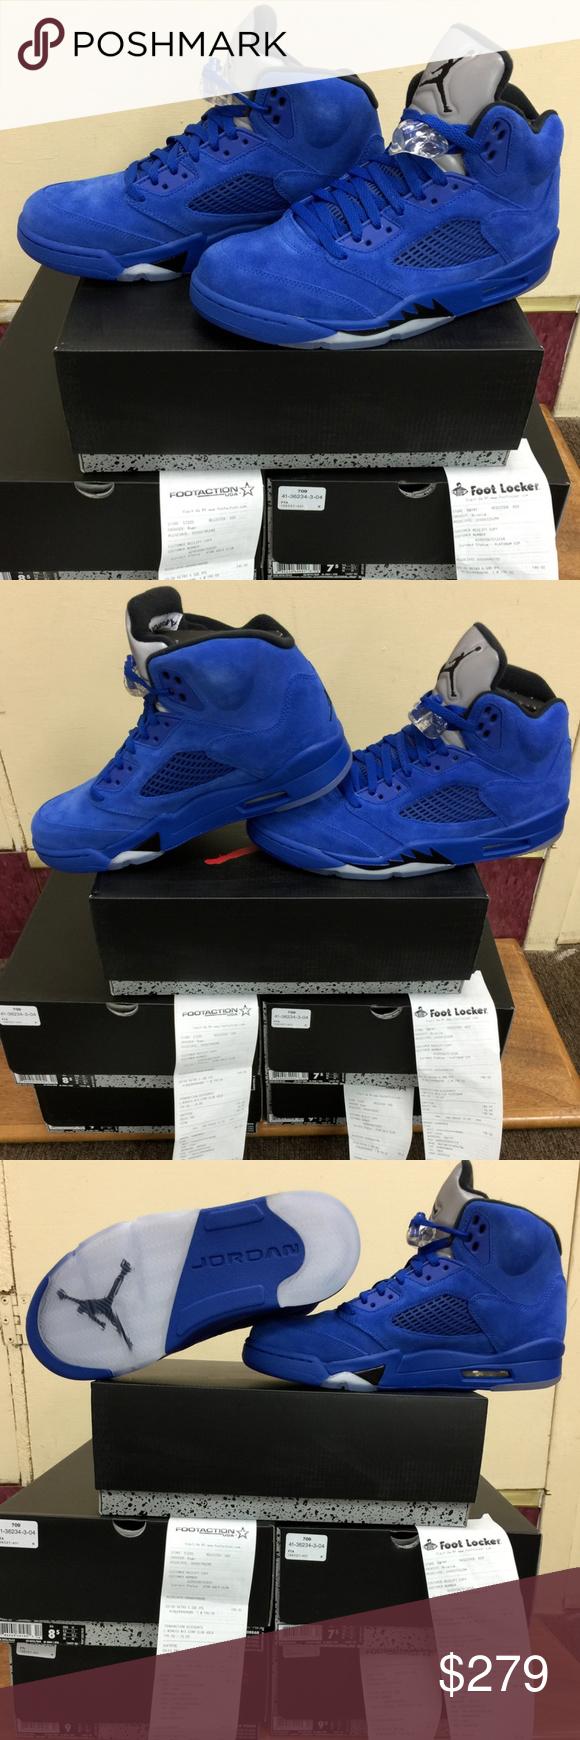 c5408c11a277 Nike Air Jordan V Retro 5 Blue Suede Game Royal New with box  A brand-new